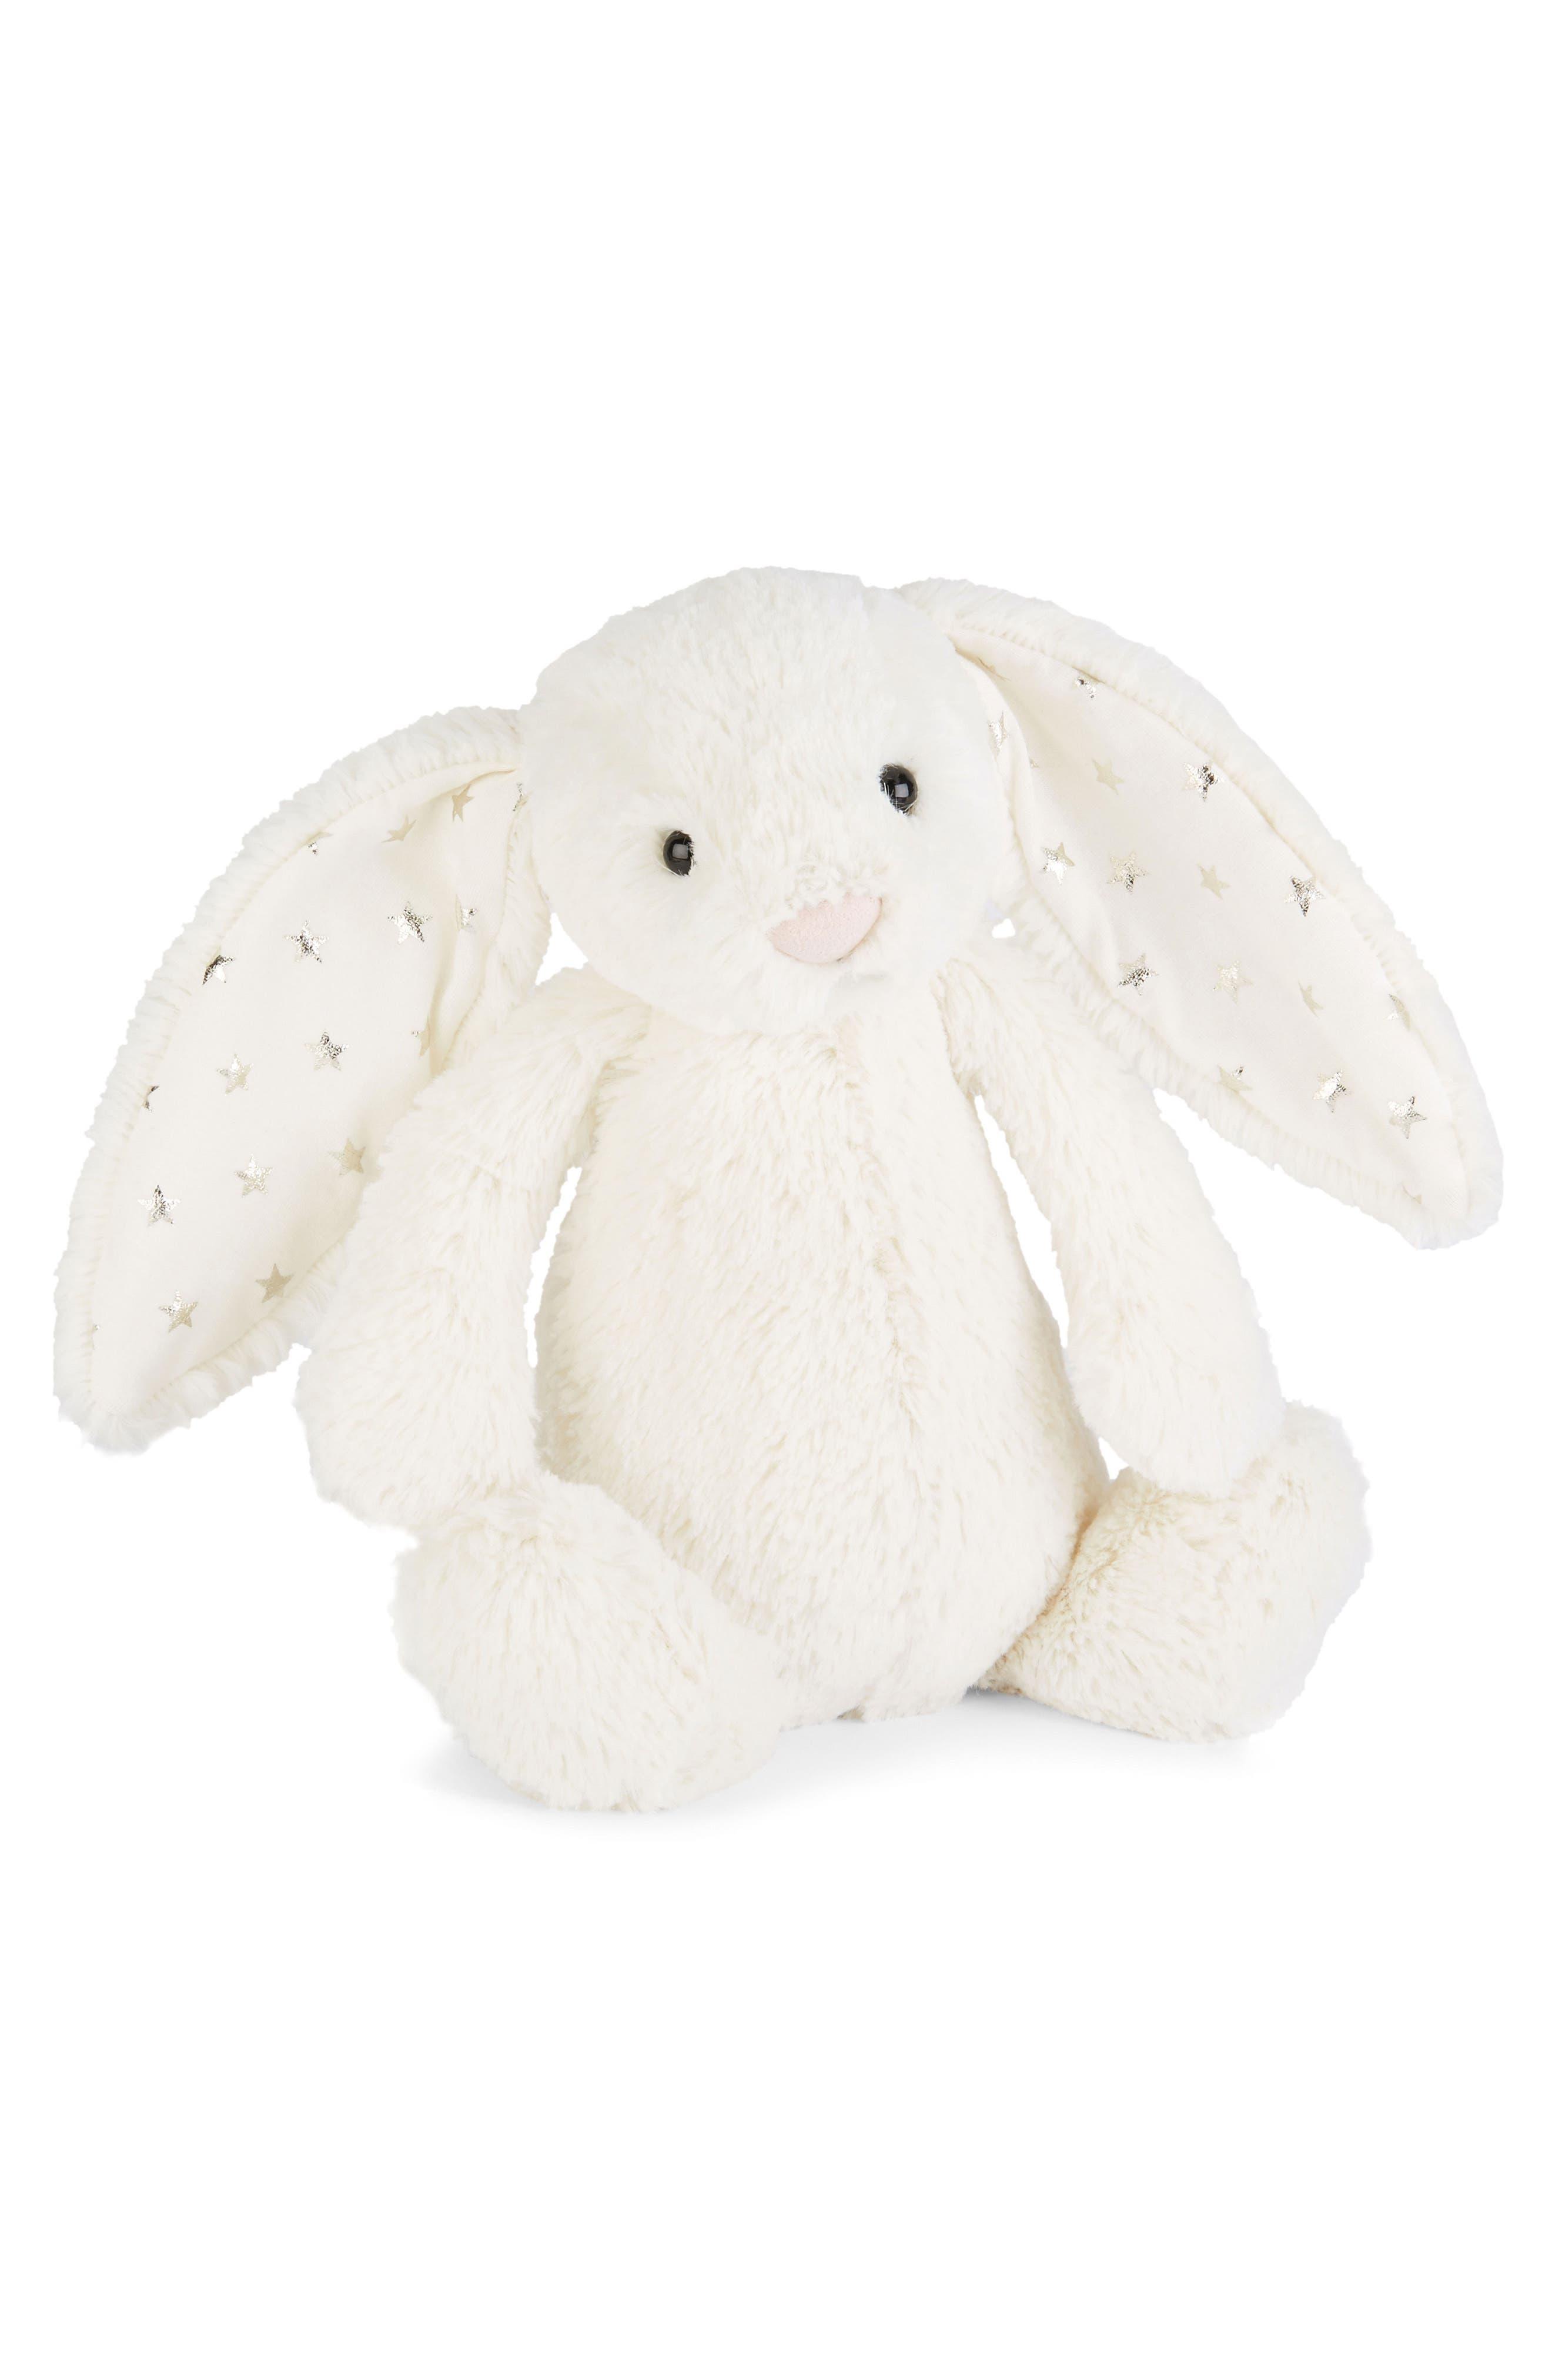 Twinkle Bunny Stuffed Animal,                         Main,                         color, 102